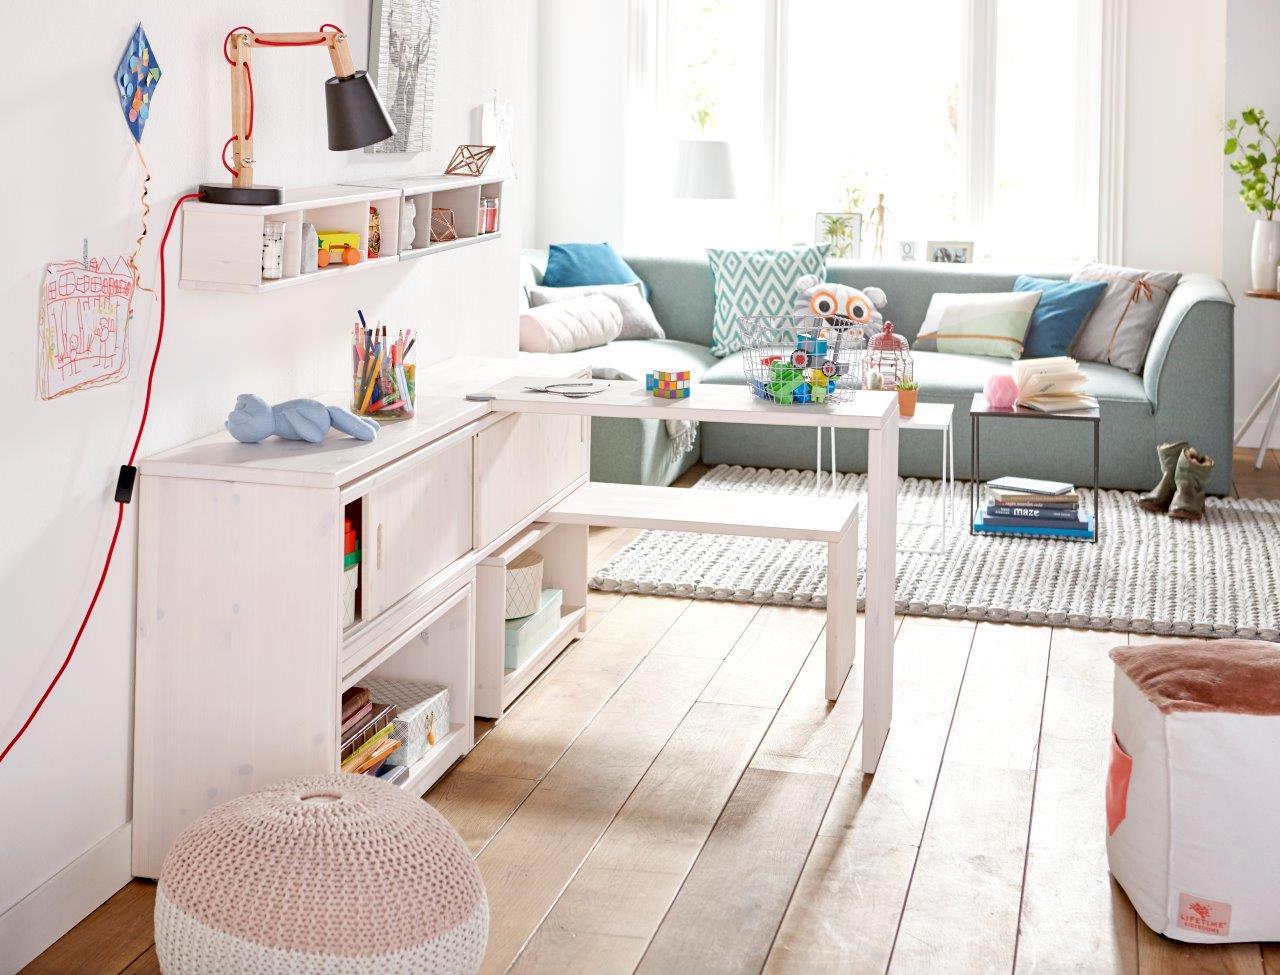 Easyway speelgoedkast met tafel en bankjes